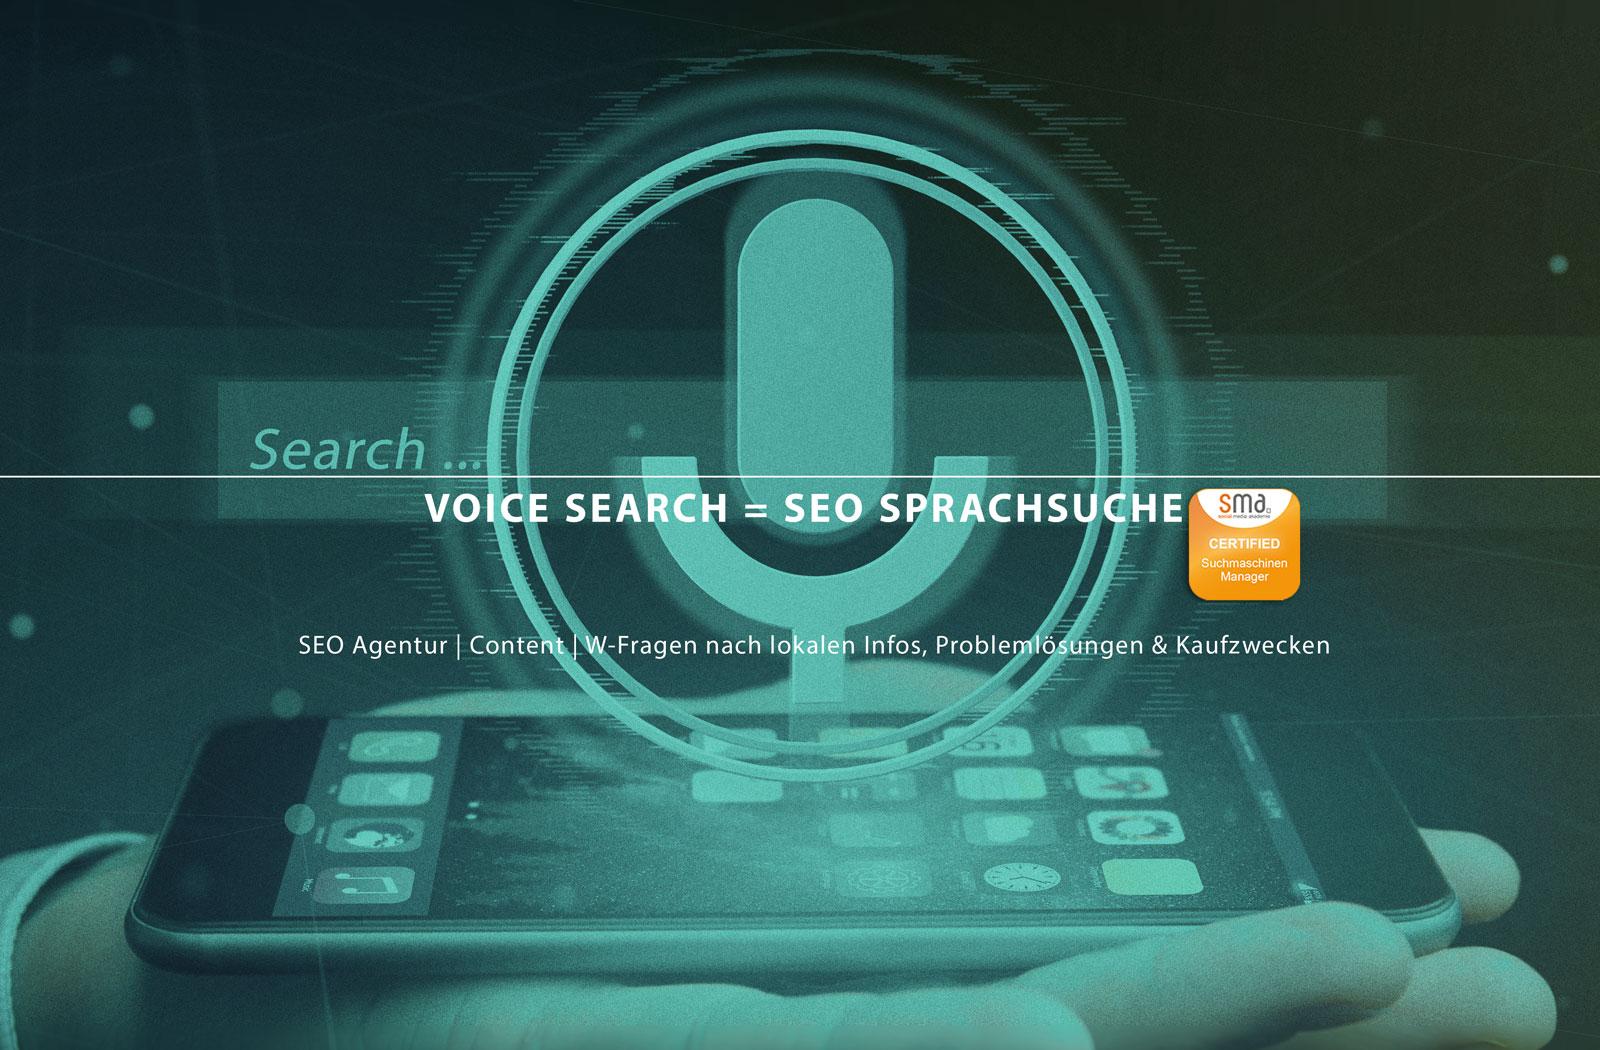 Voice Search SEO Sprachsuche: SEO Agentur